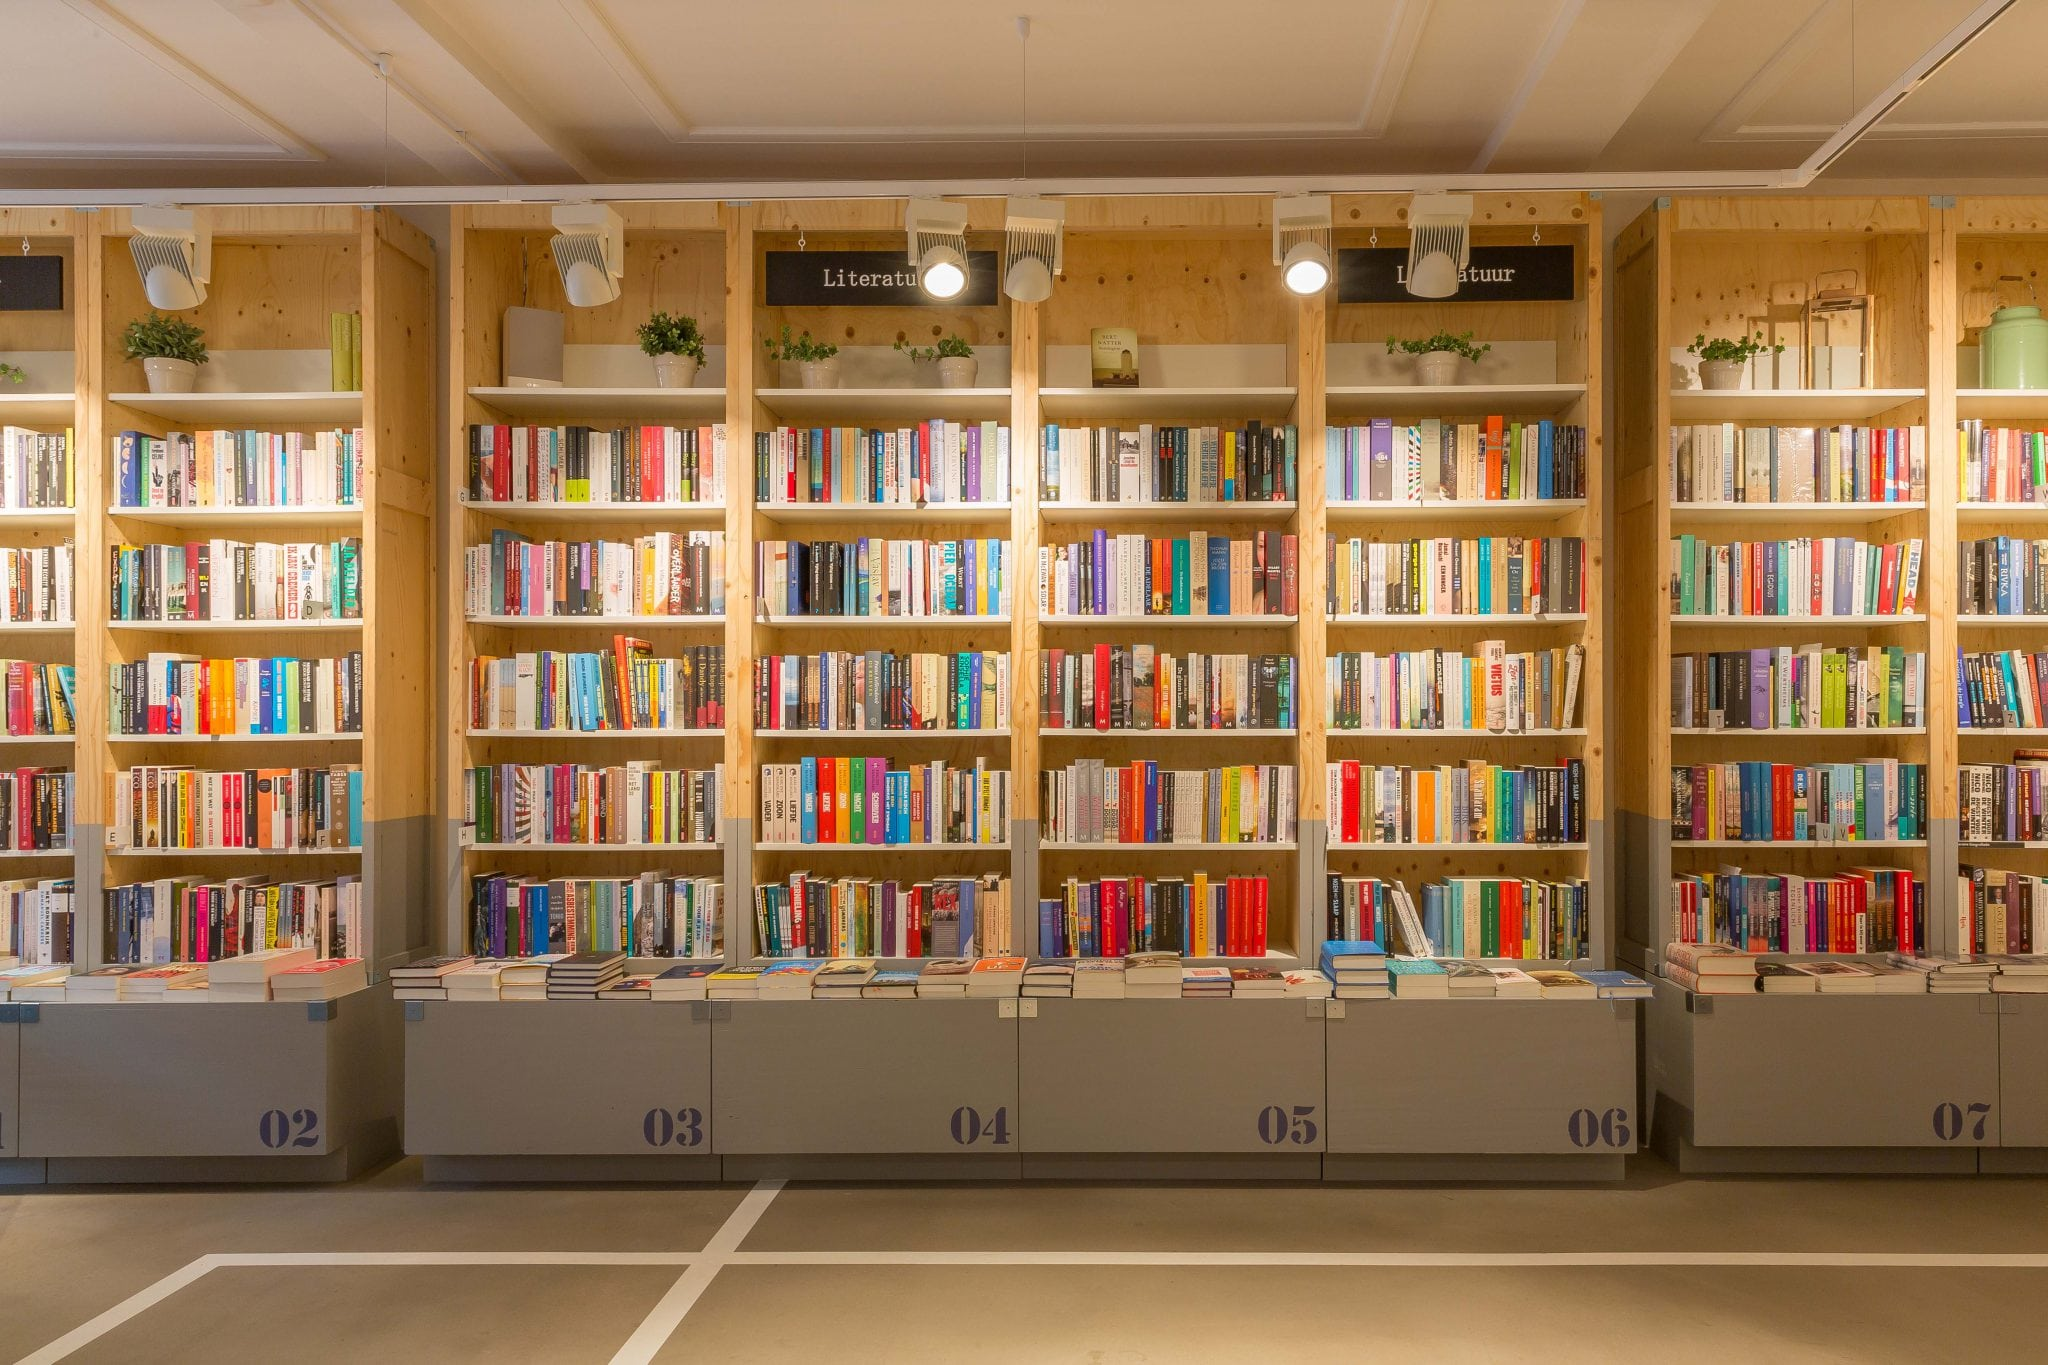 Hiddemafotografie-boekhandel kooyker (7)